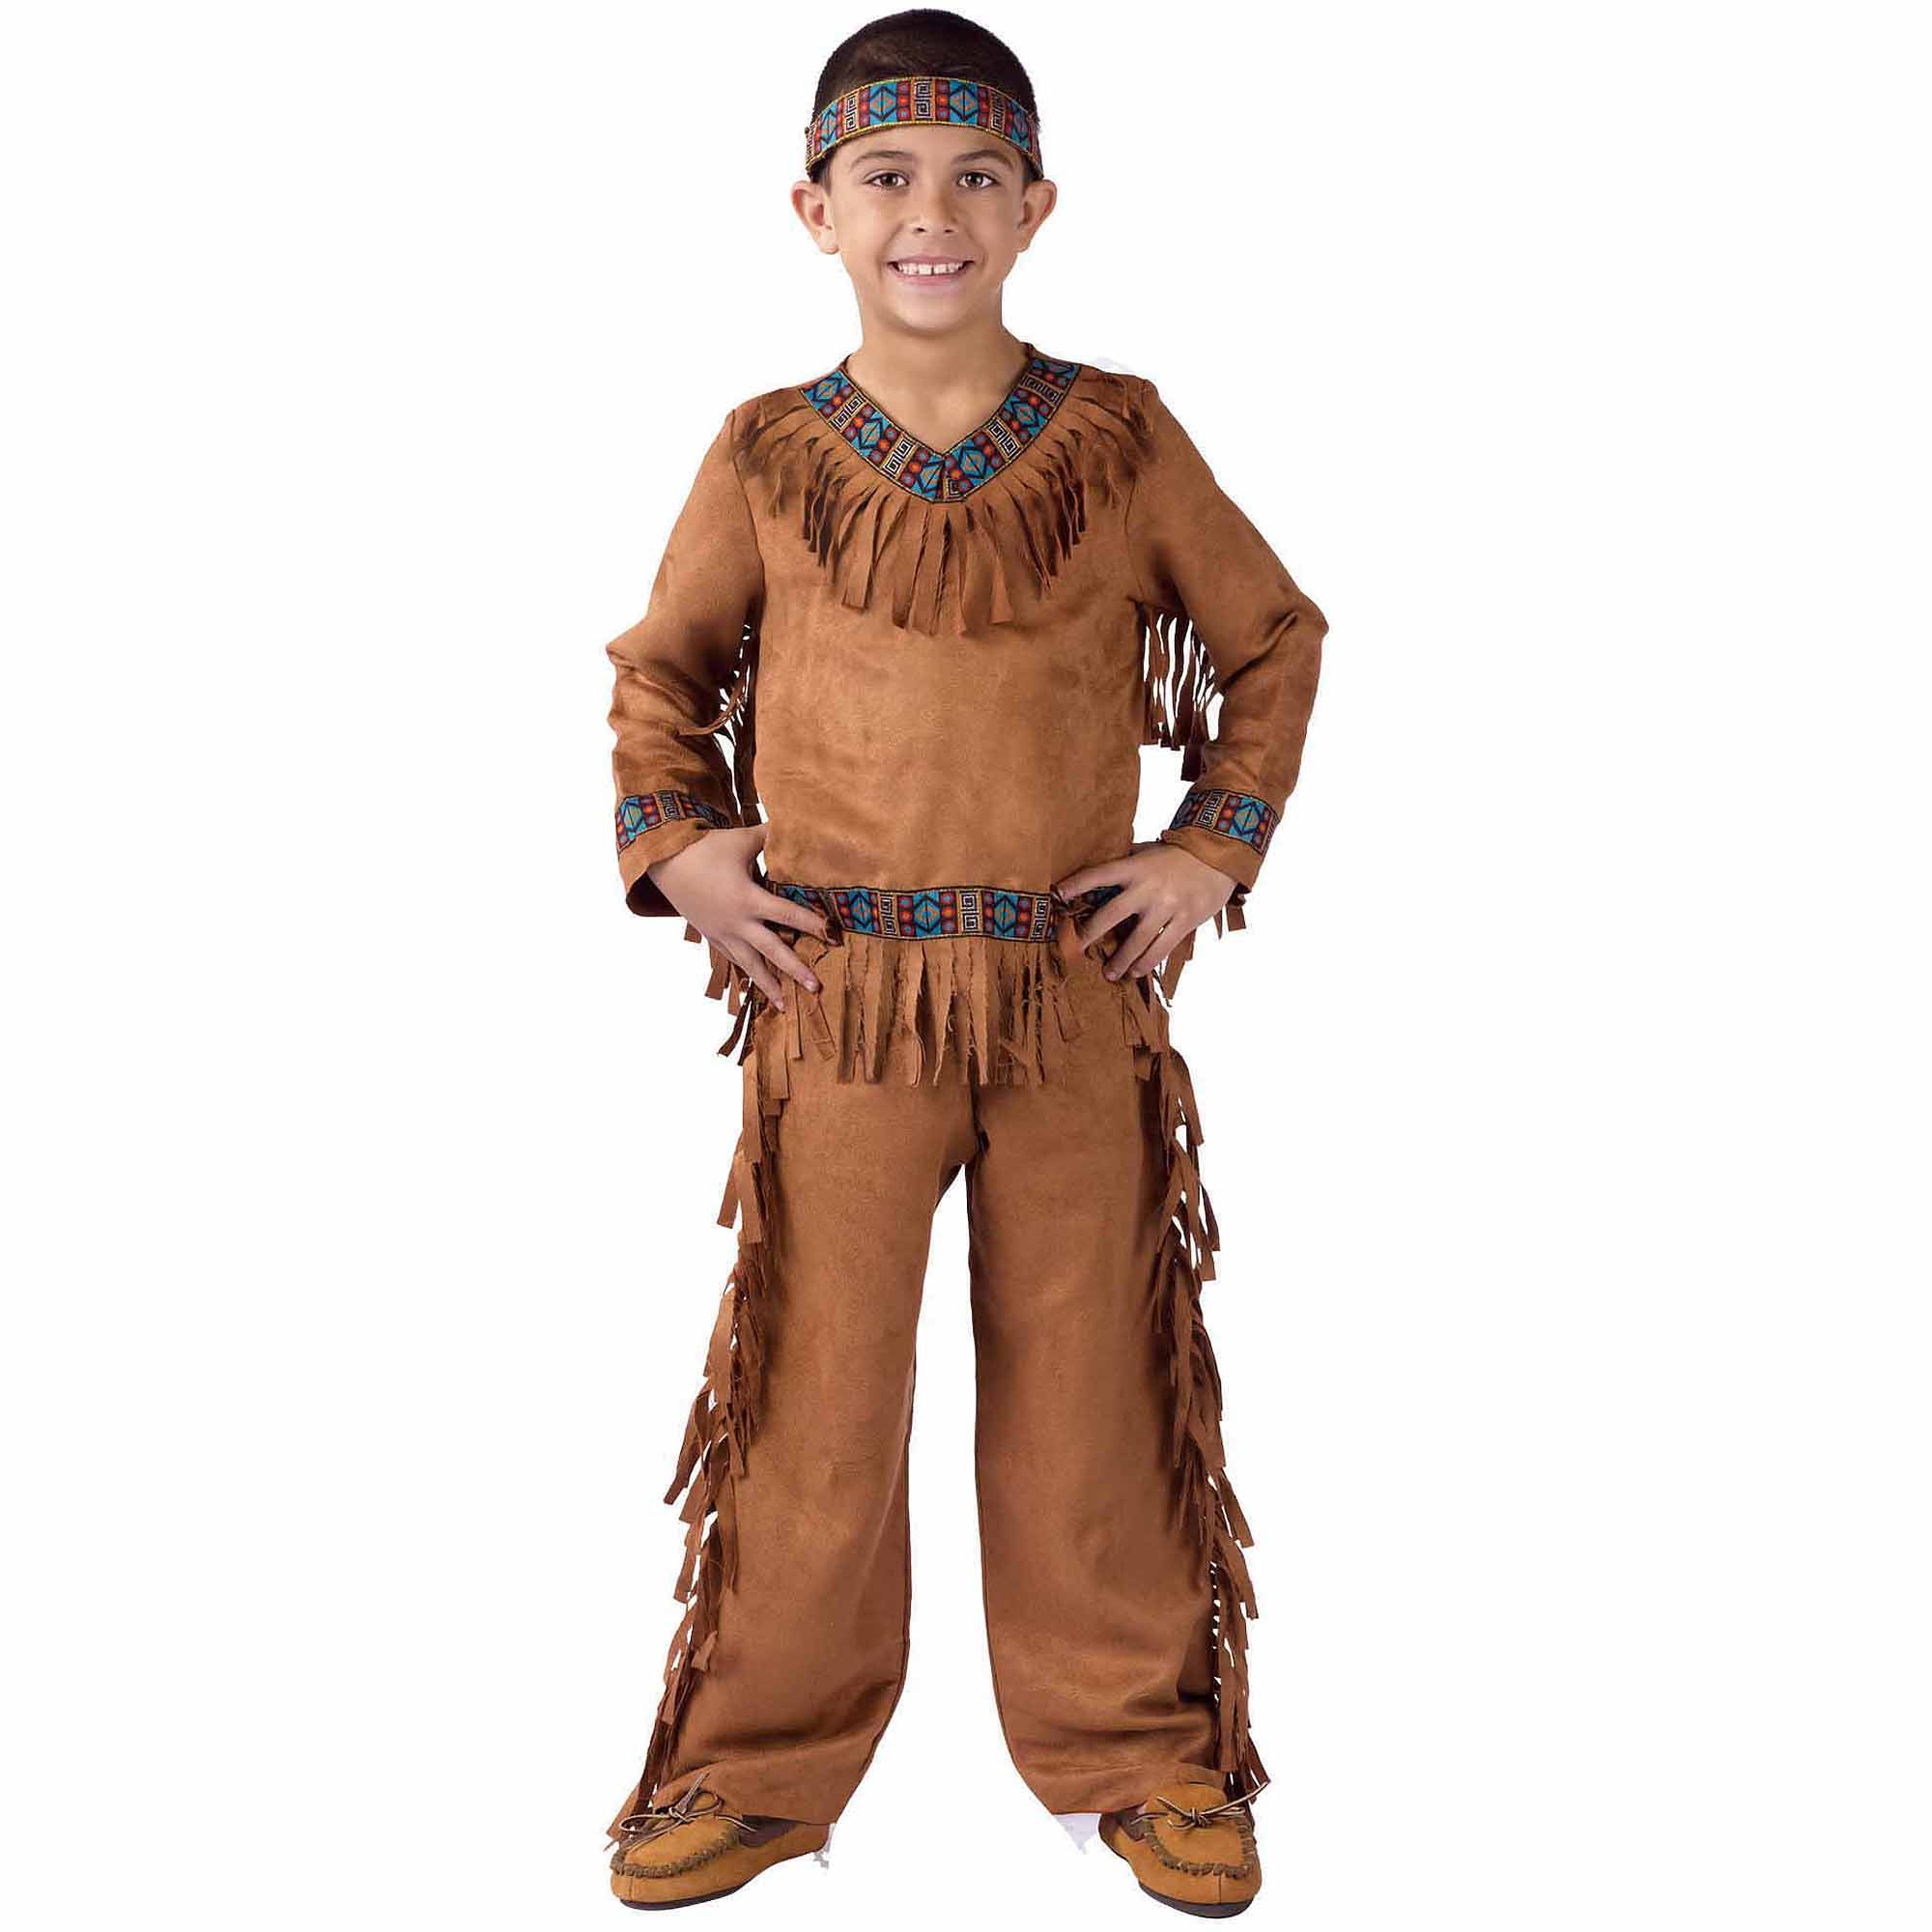 sc 1 st  Walmart & Native American Boy Child Halloween Costume - Walmart.com